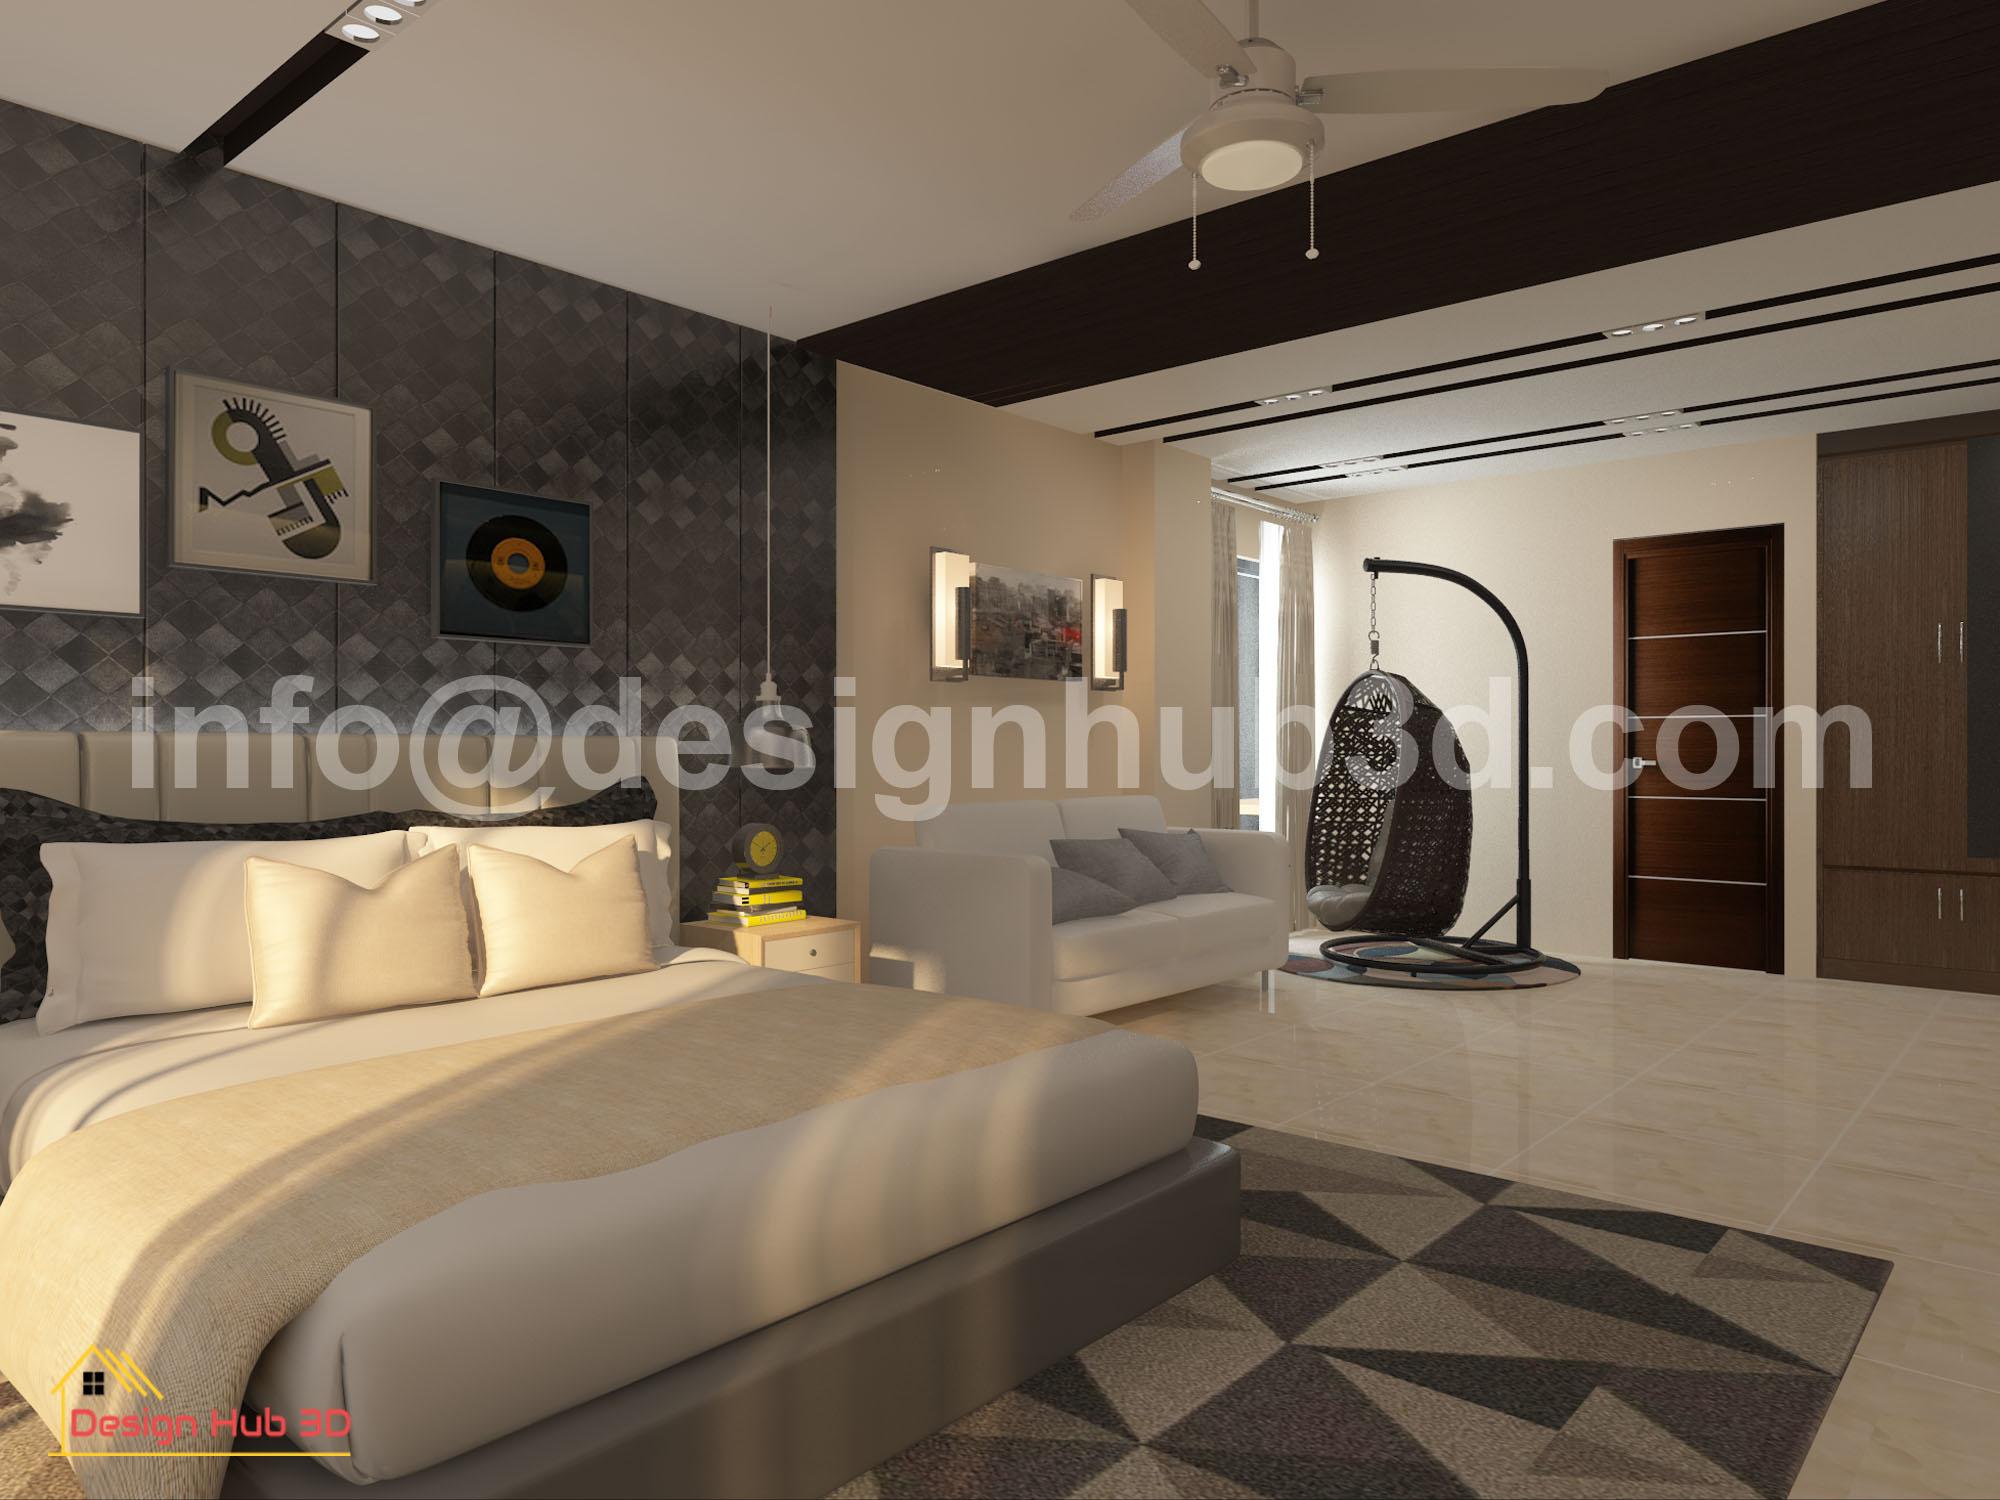 Design Hub 3D - Master Bed interior design